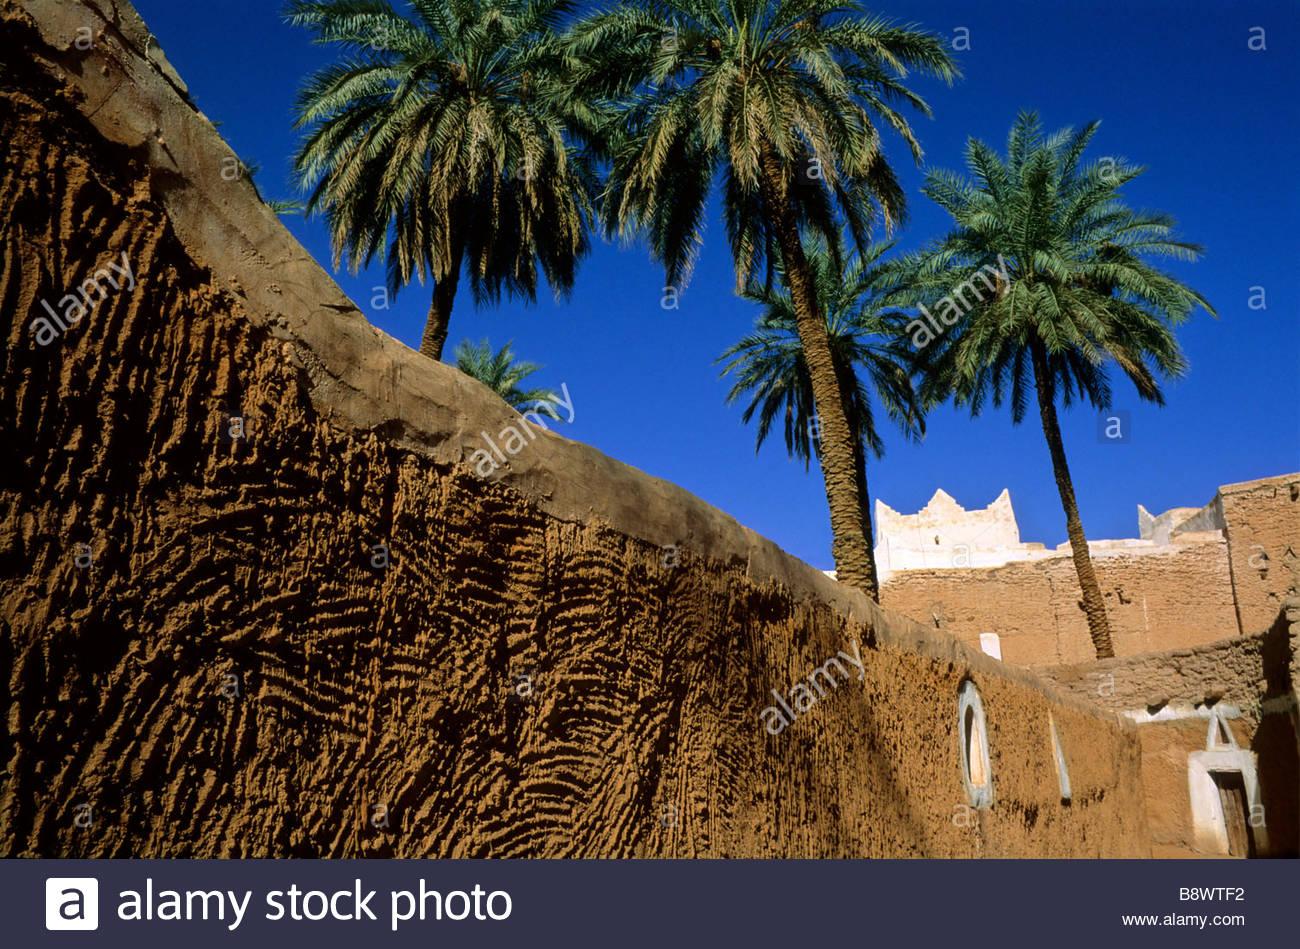 medina of gadames, lybia, africa, - Stock Image